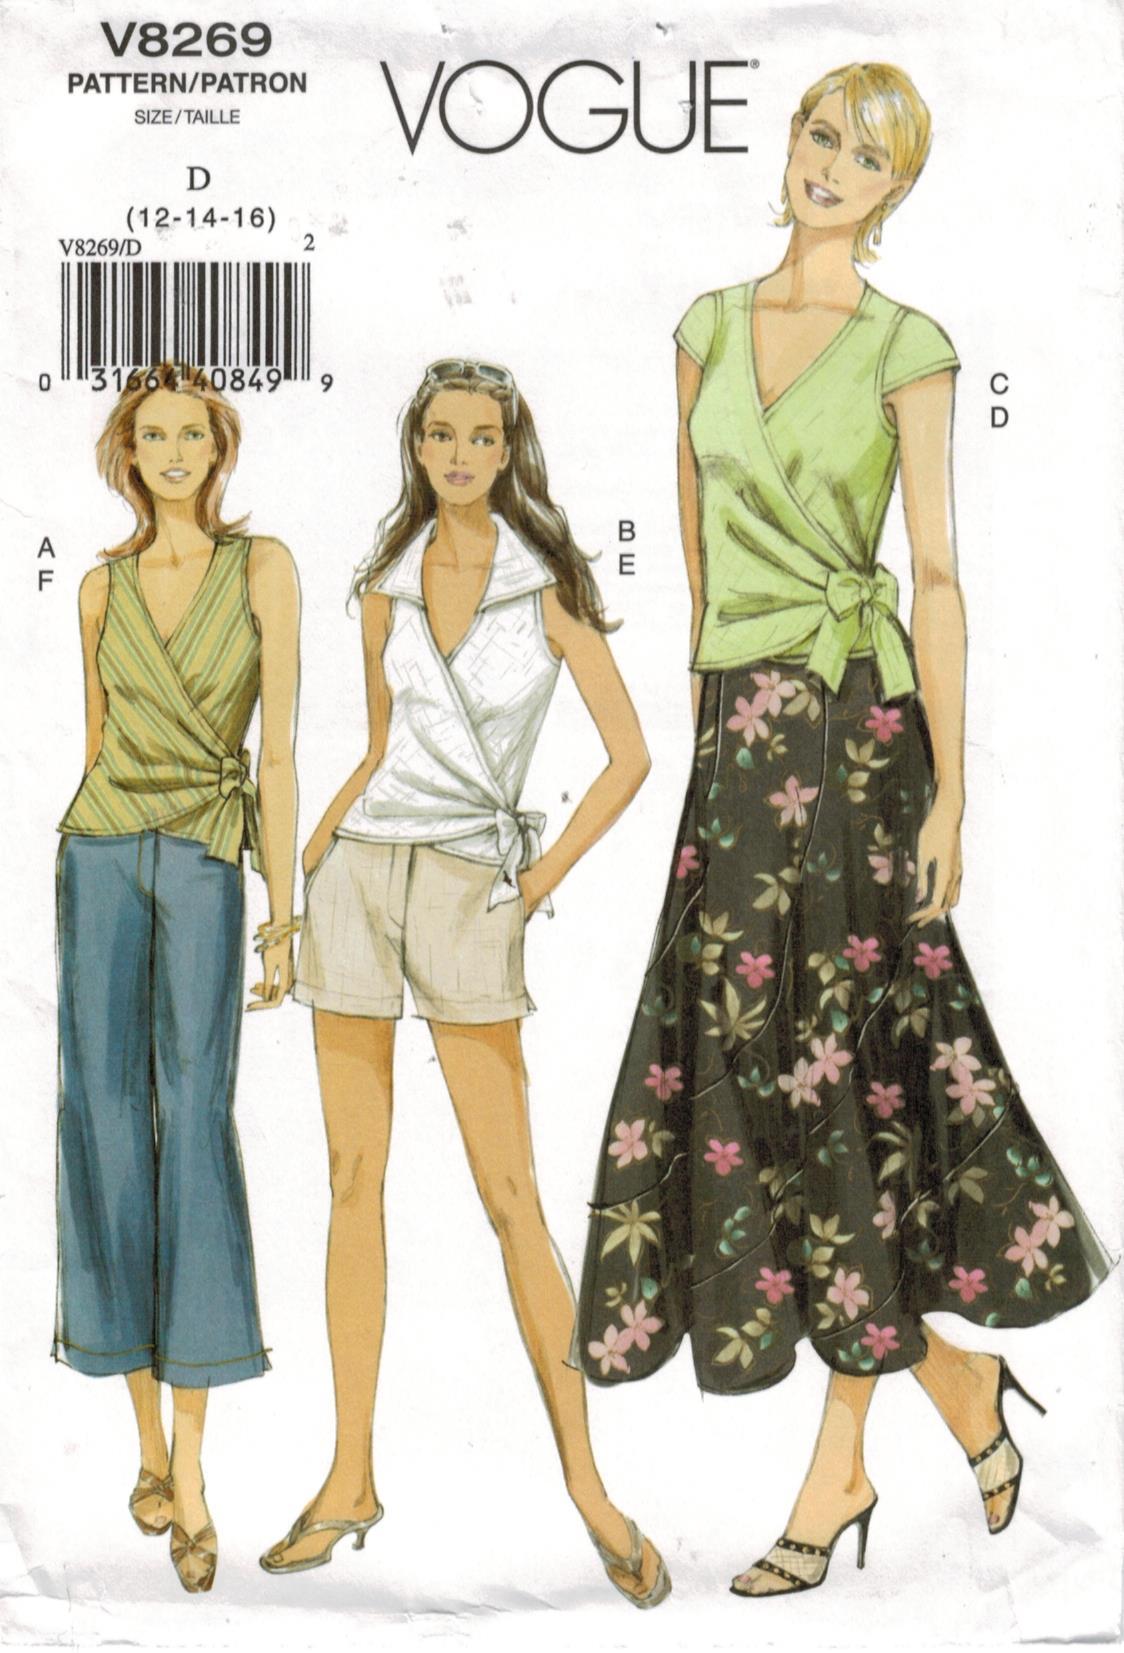 13ea8f5ec23ab Vogue Pattern 8269 Misses sportswear wardrobe – wrap top, skirt, shorts and  capri pants sizes 12, 14, 16